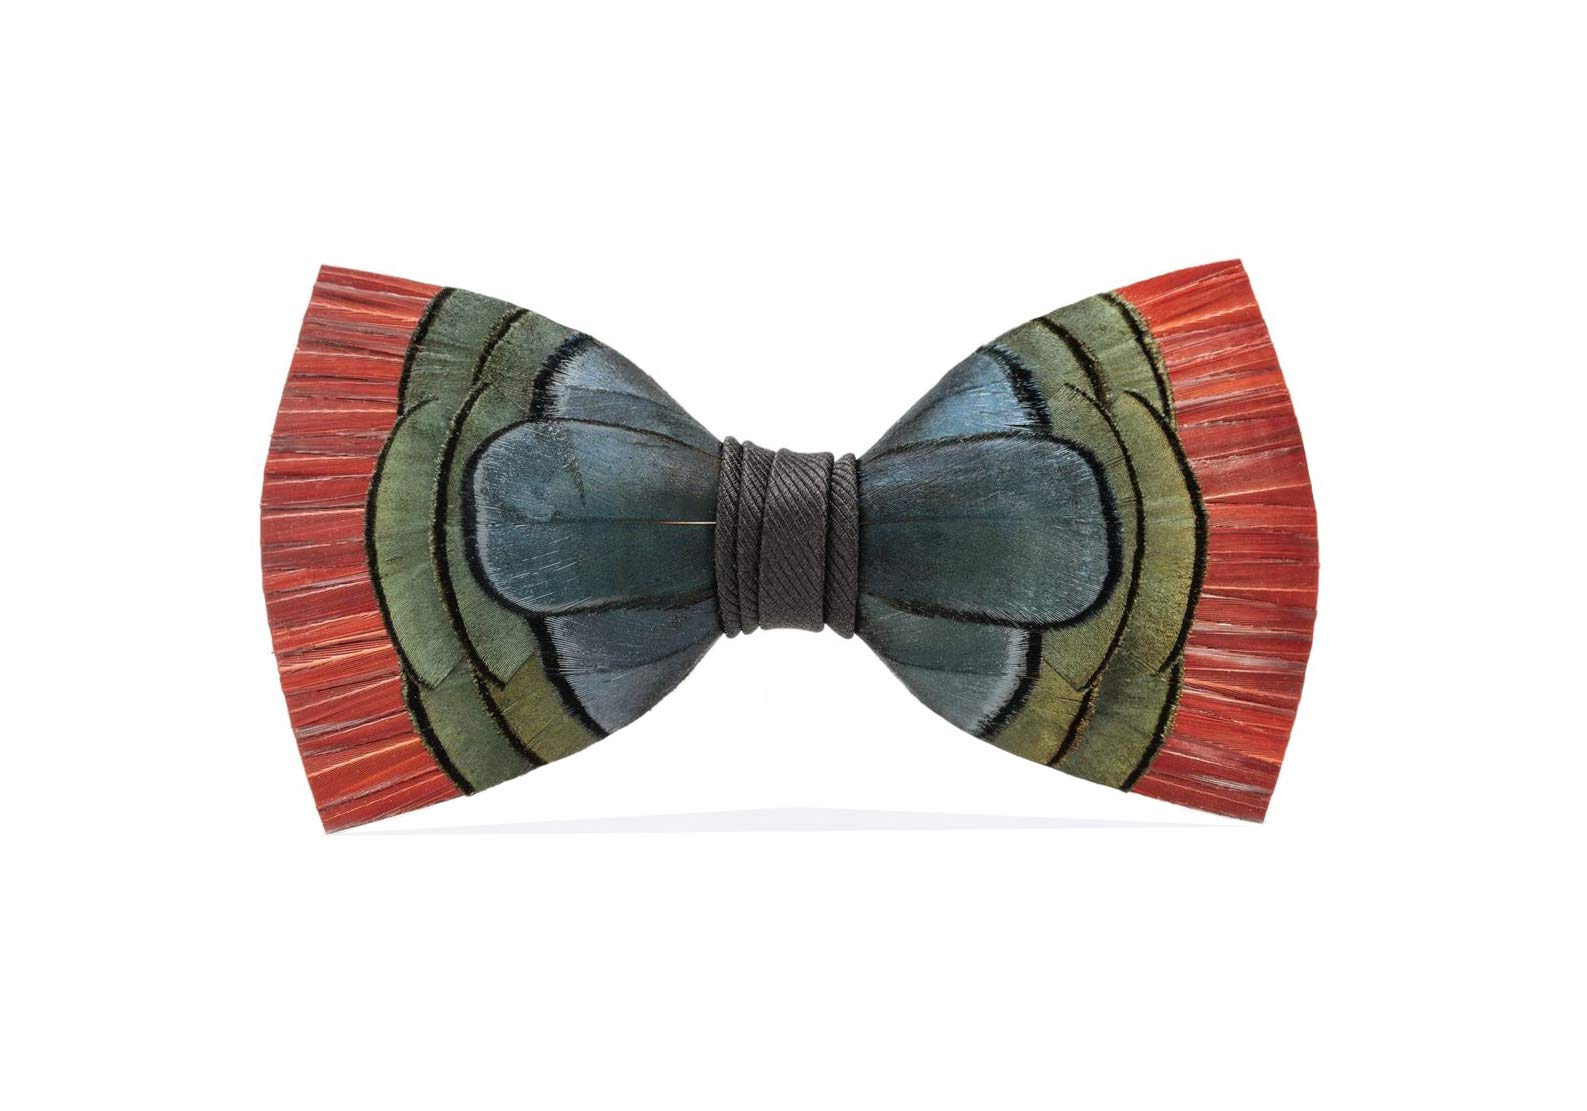 Brackish Bow Tie - Hemingway